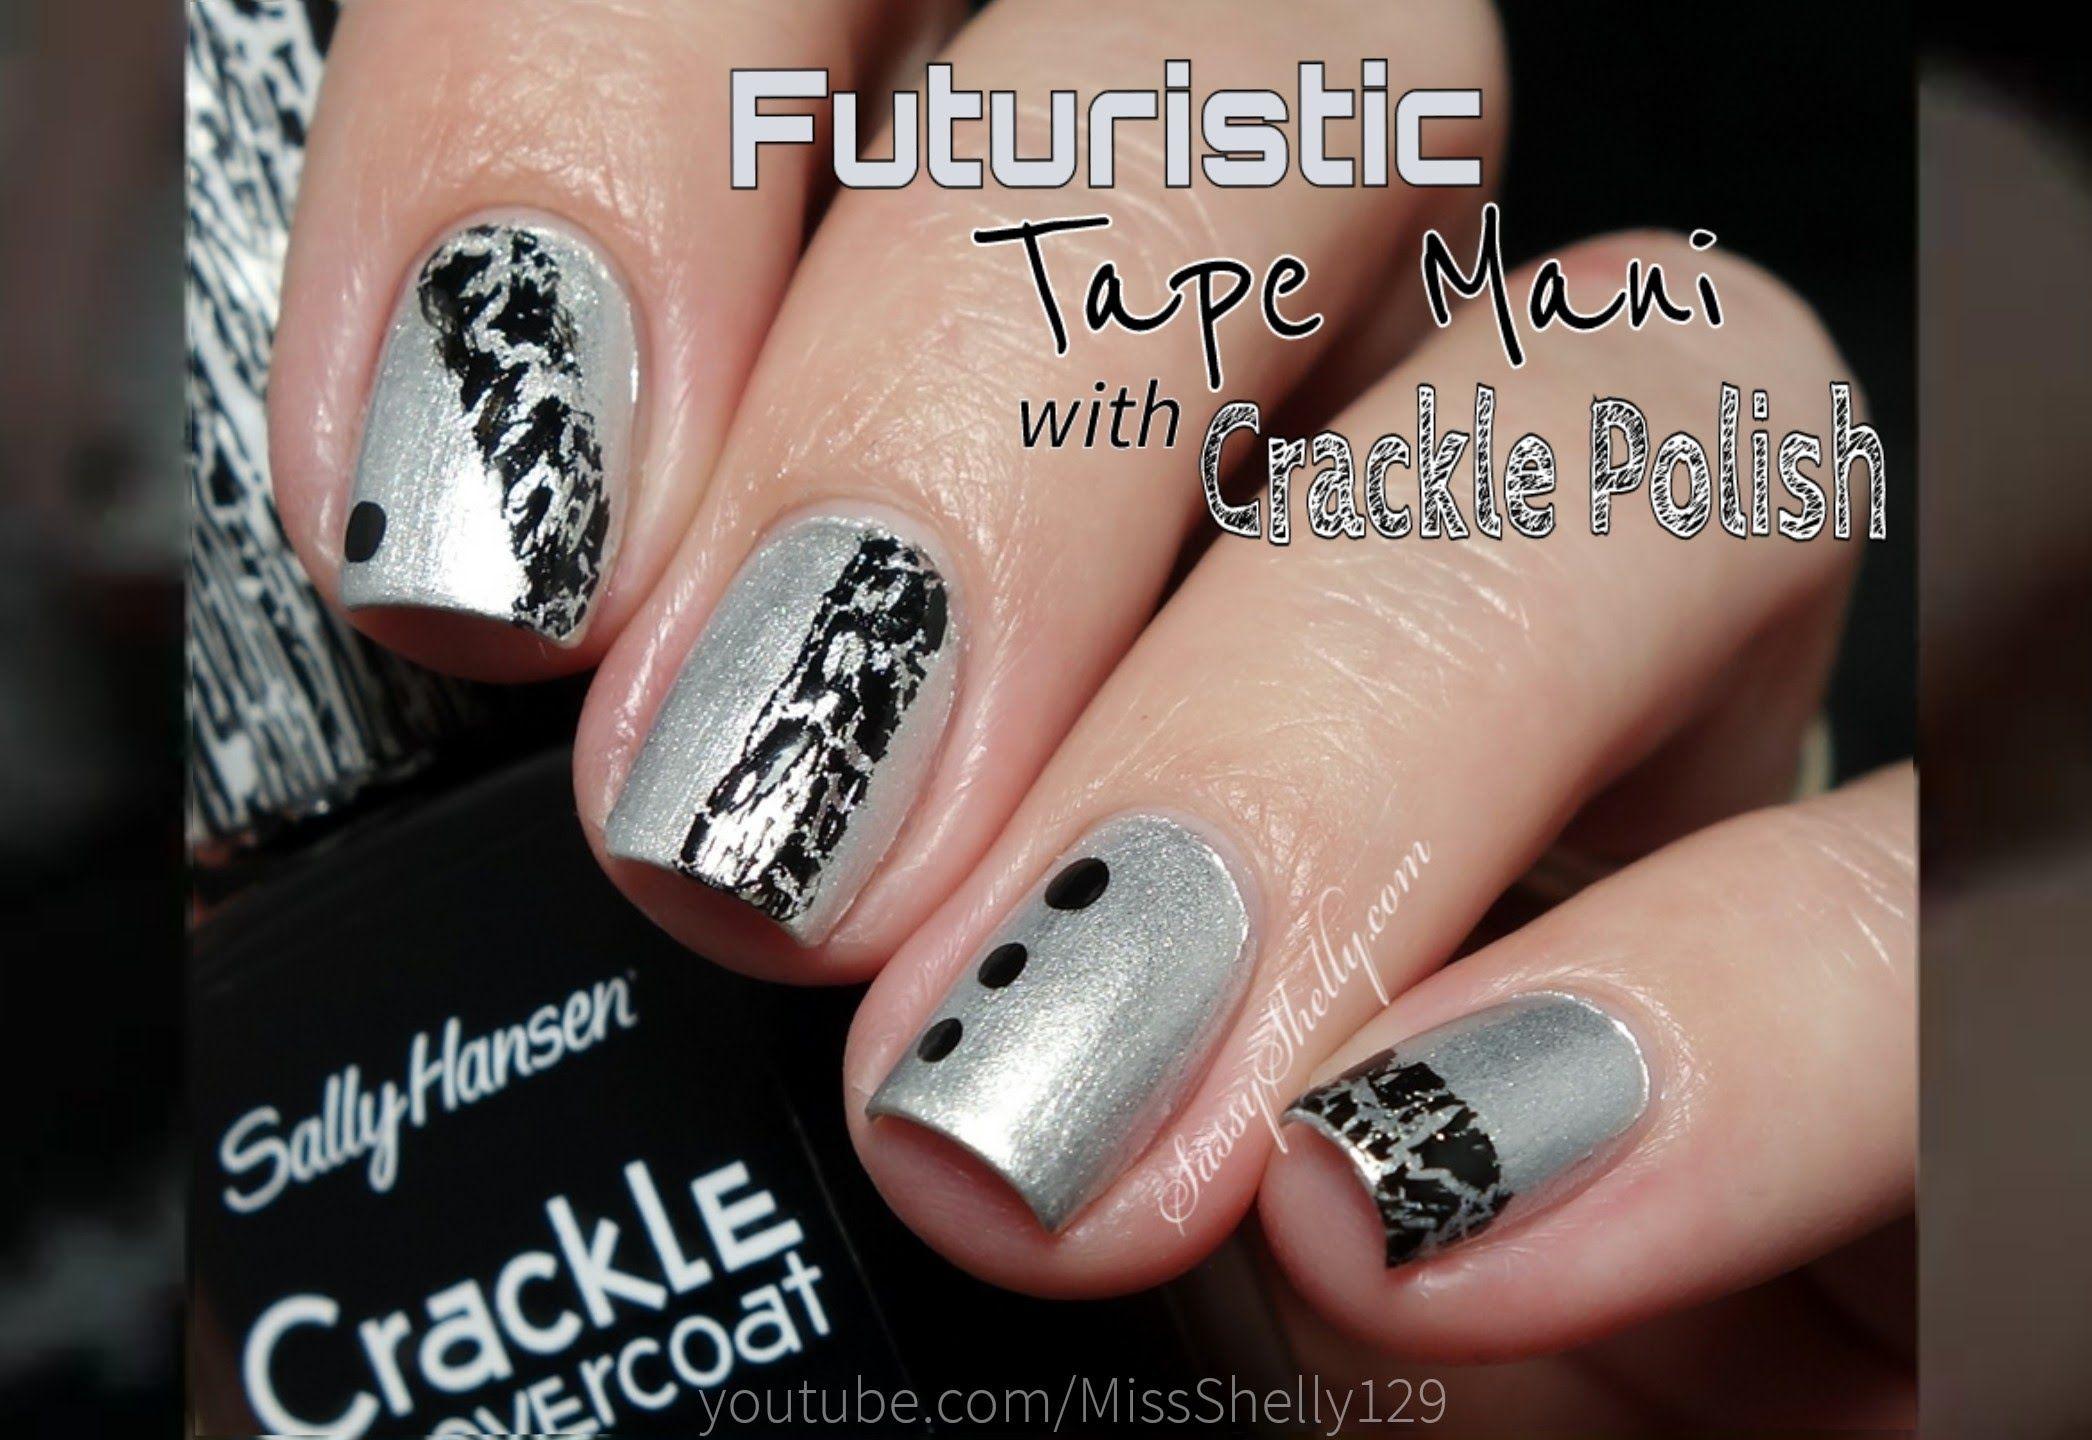 Easy Nail Art Black Silver Tape Mani With Sally Hansen Crackle Polish